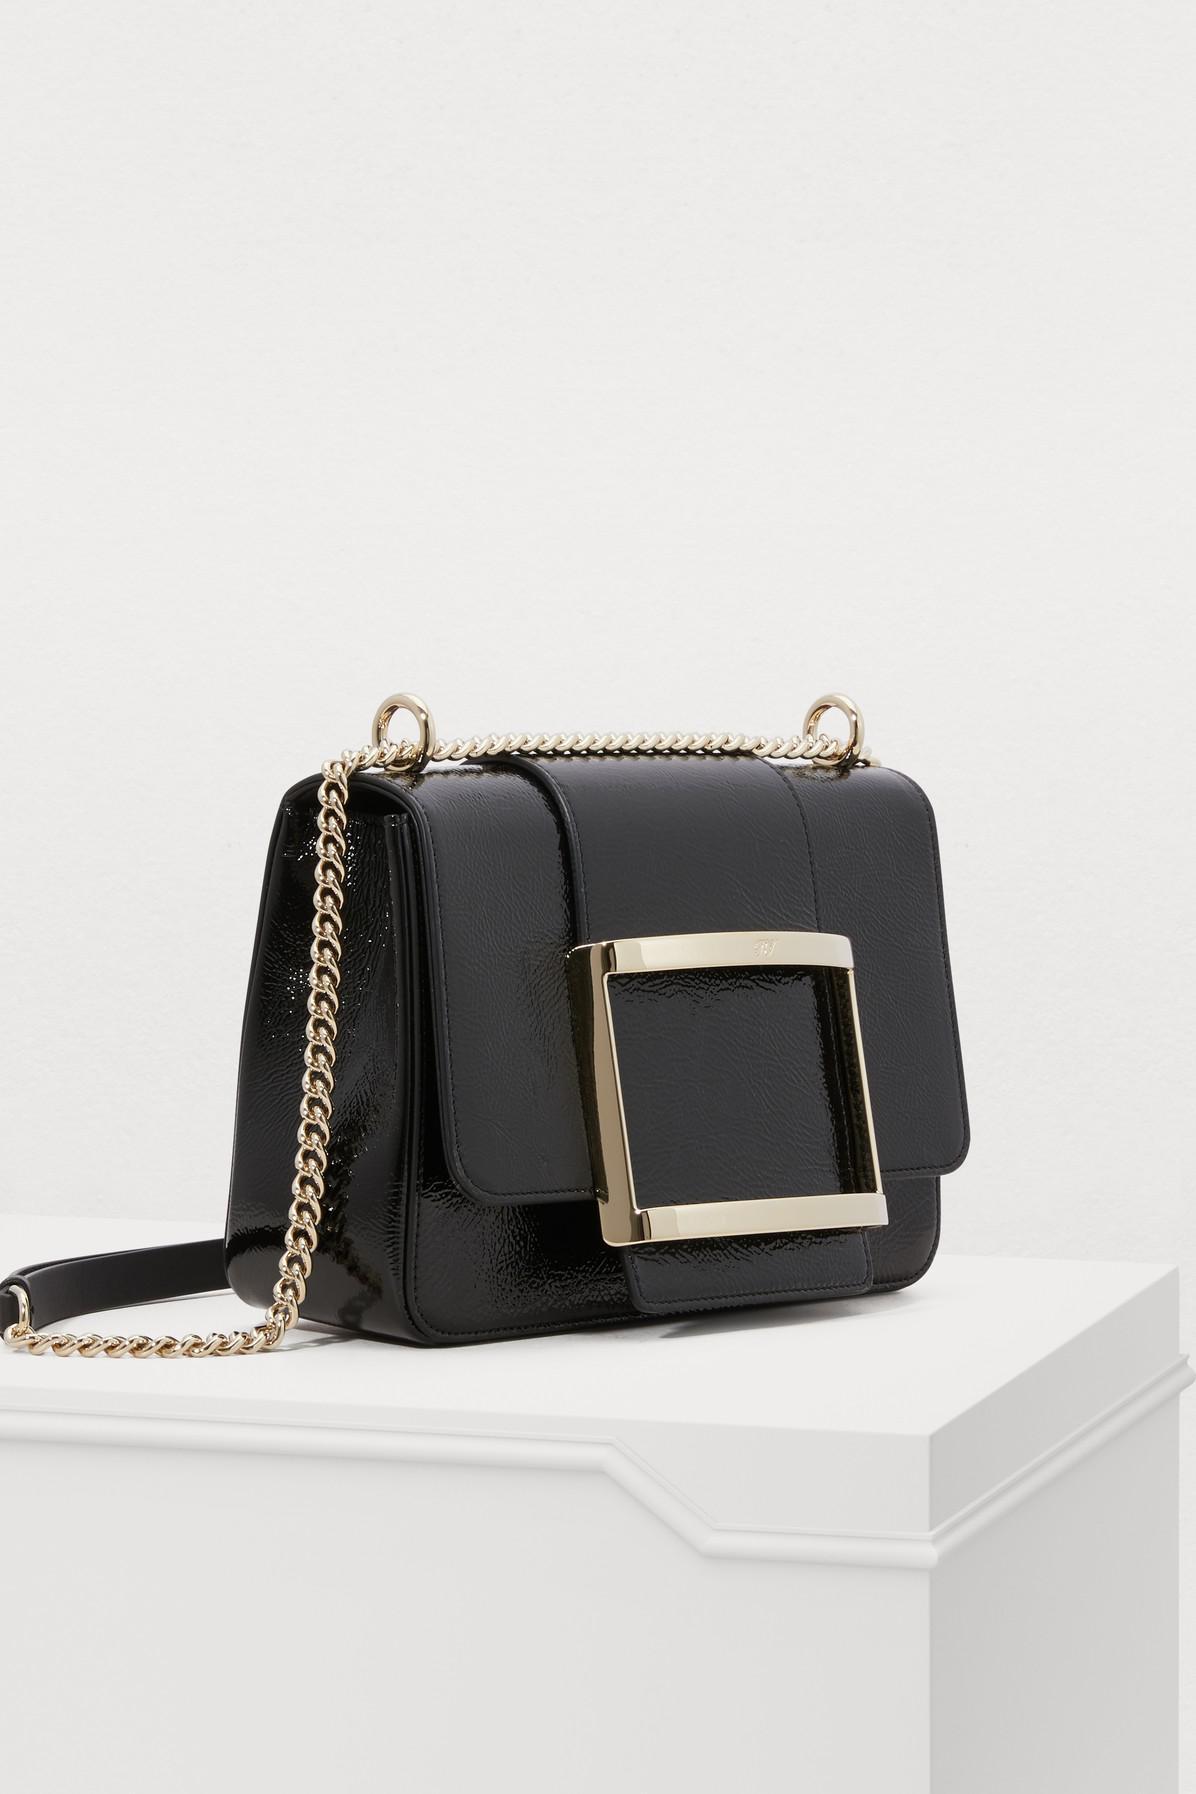 Roger Vivier - Black Très Vivier Small Shoulder Bag - Lyst. View fullscreen 6b4df2193ffee